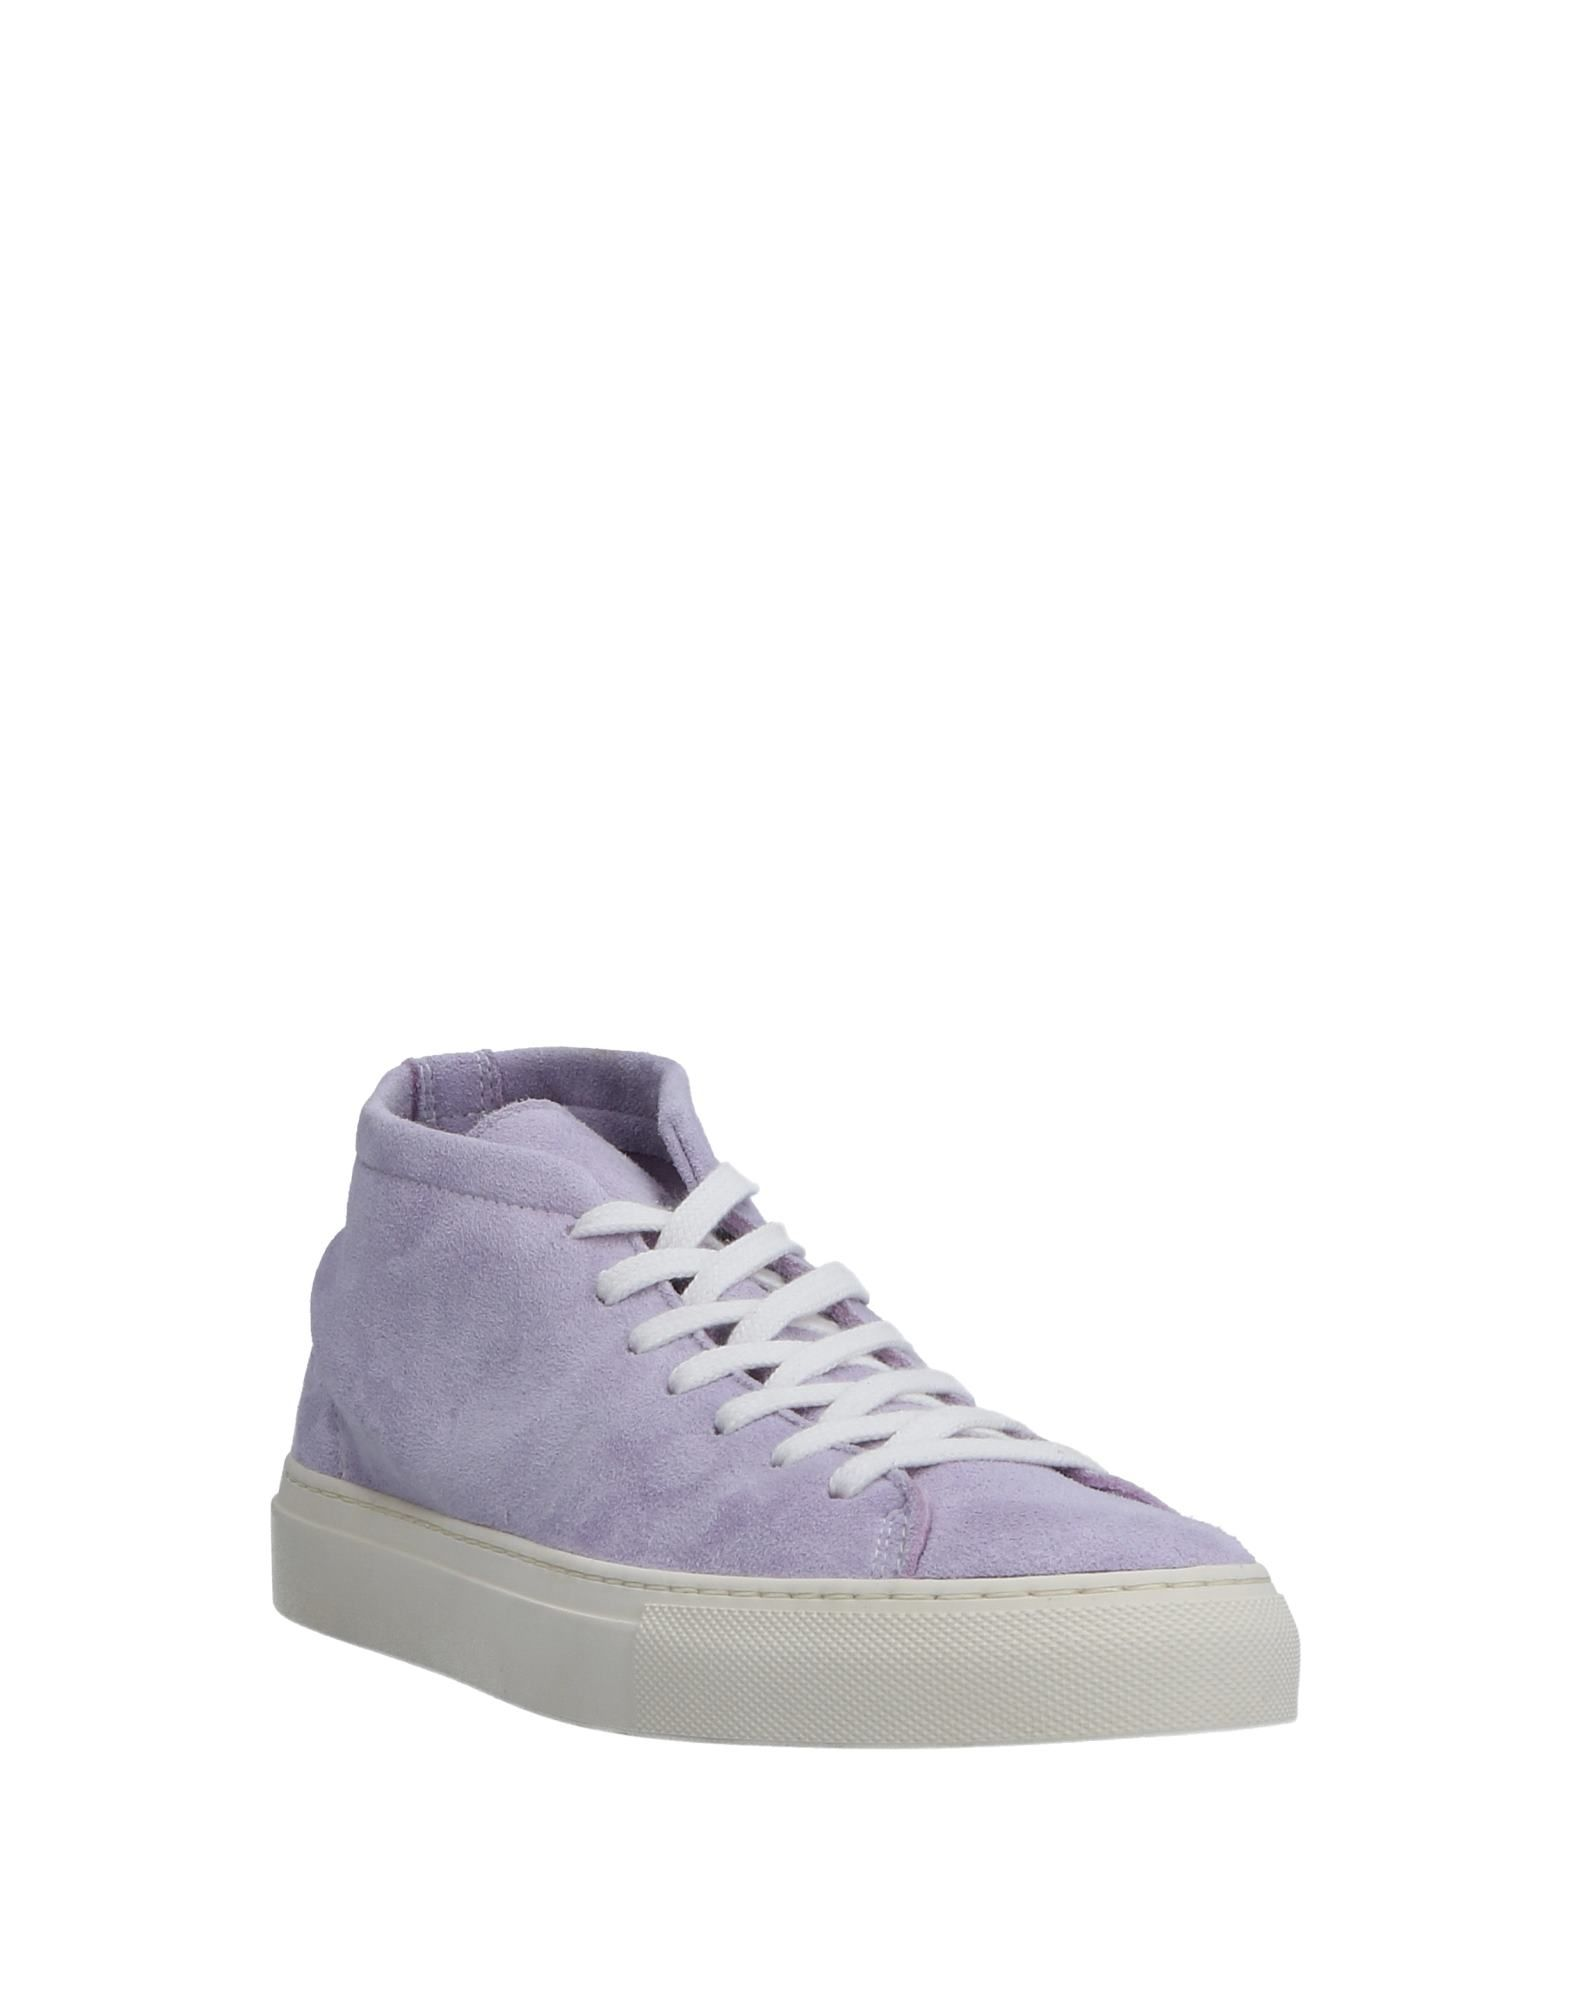 Diemme Sneakers Herren  11531387SC Gute Qualität beliebte Schuhe